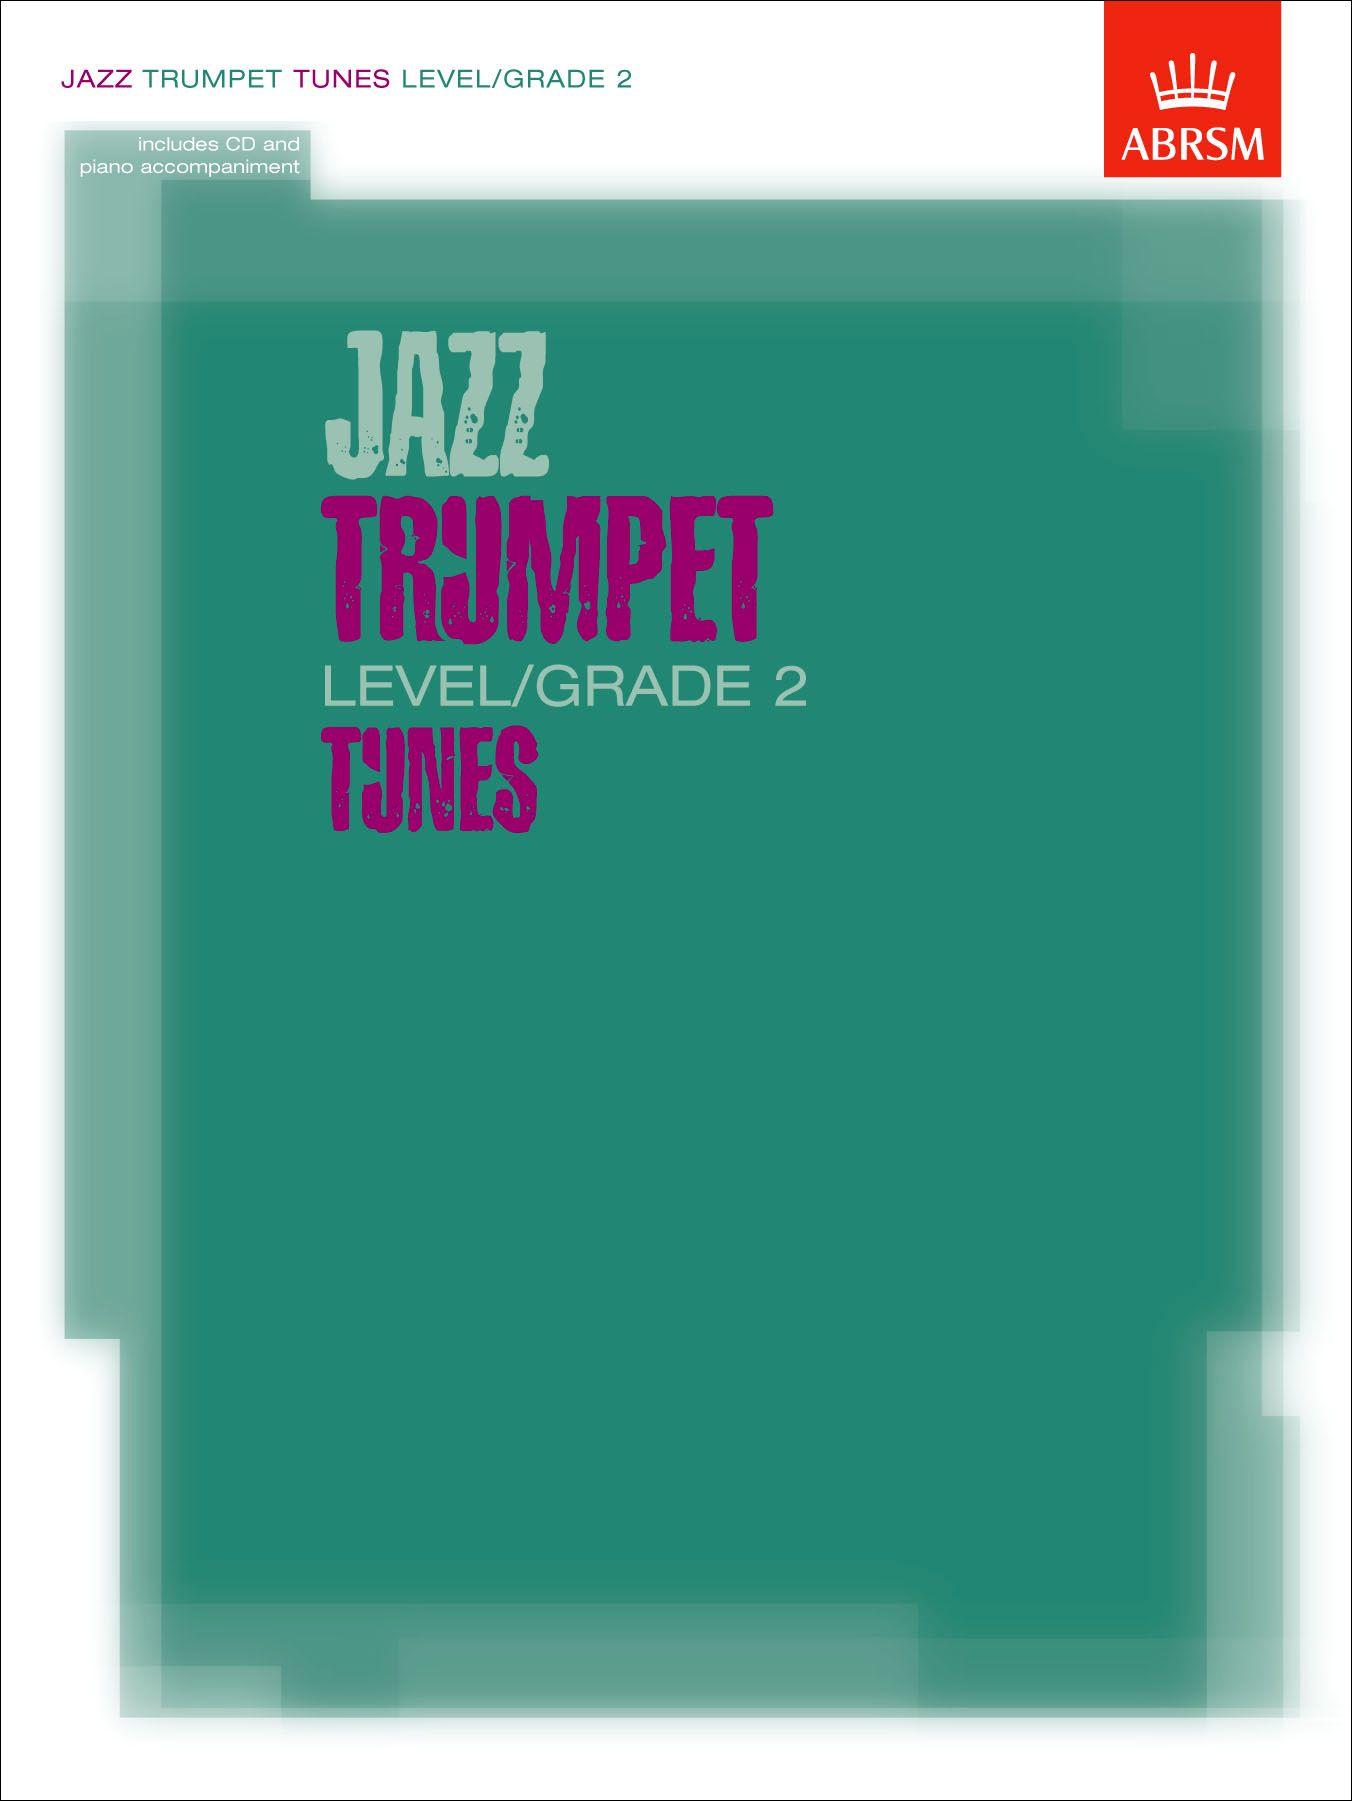 ABRSM Jazz Trumpet Level / Grade 2 Tunes - Score, Part & CD